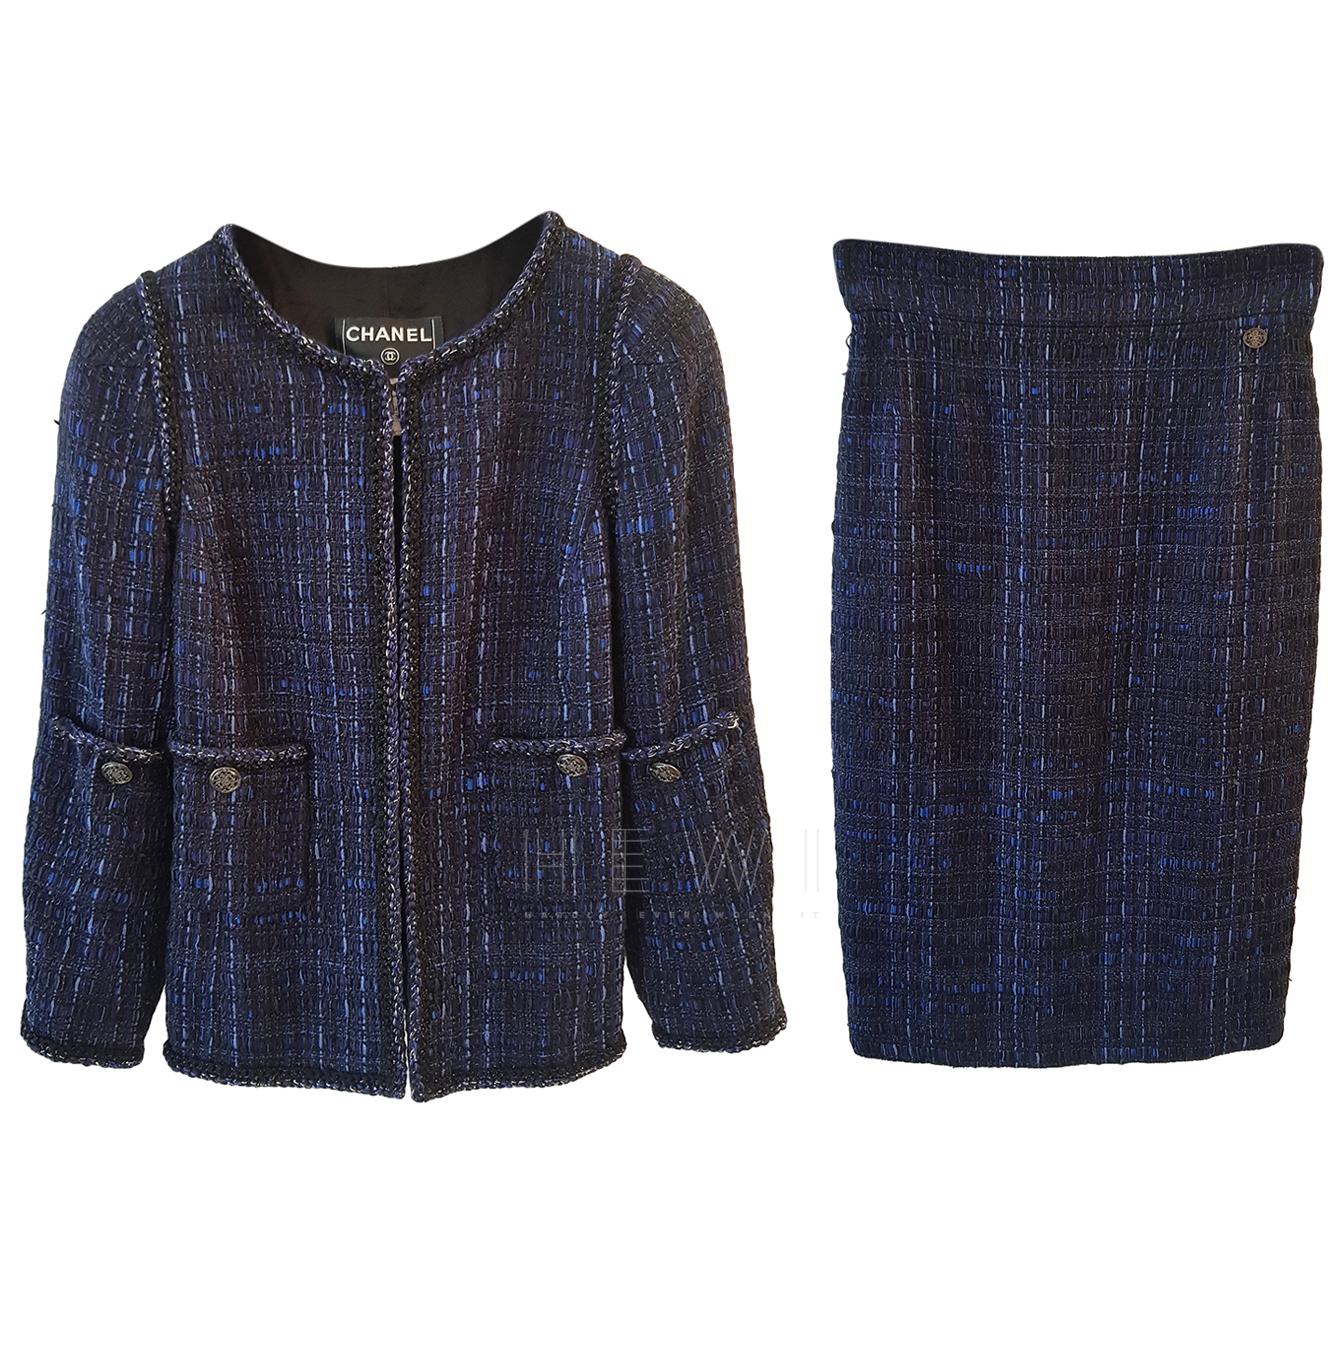 Chanel Blue Tweed Skirt Suit